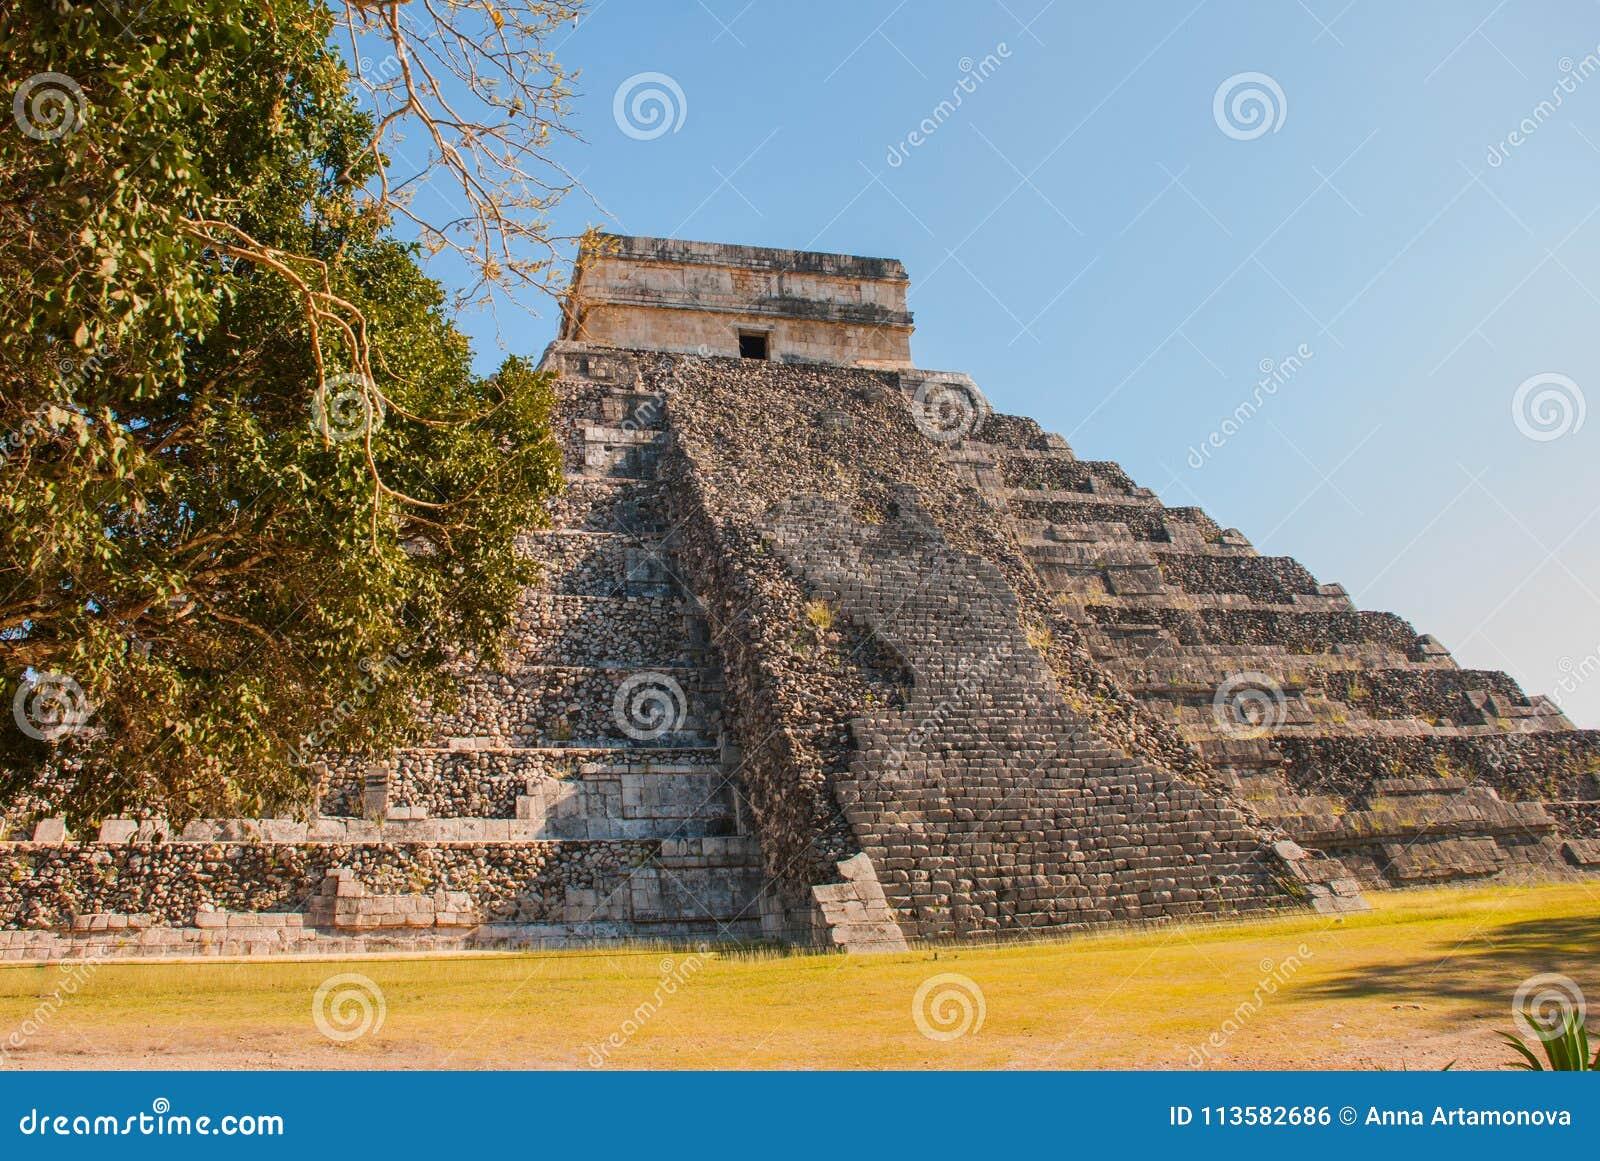 Anicent Maya mayan pyramid El Castillo Kukulkan in Chichen-Itza, Mexico